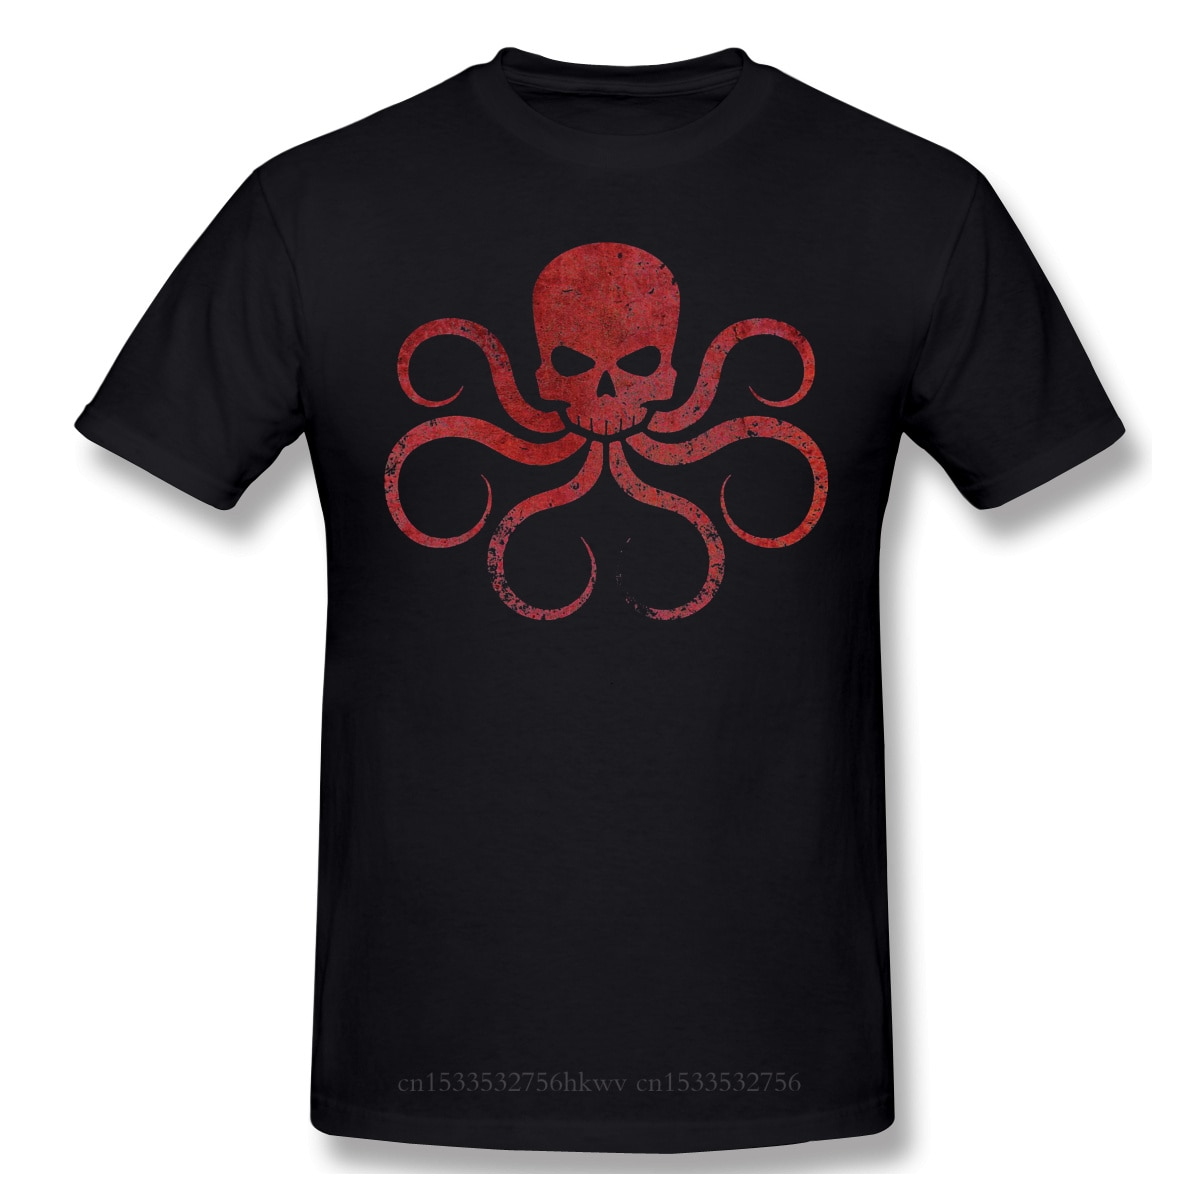 Grêle Hydra t-shirt blanc noir veuve film Natasha Romanoff imprimé t-shirt été grands t-shirts 2020